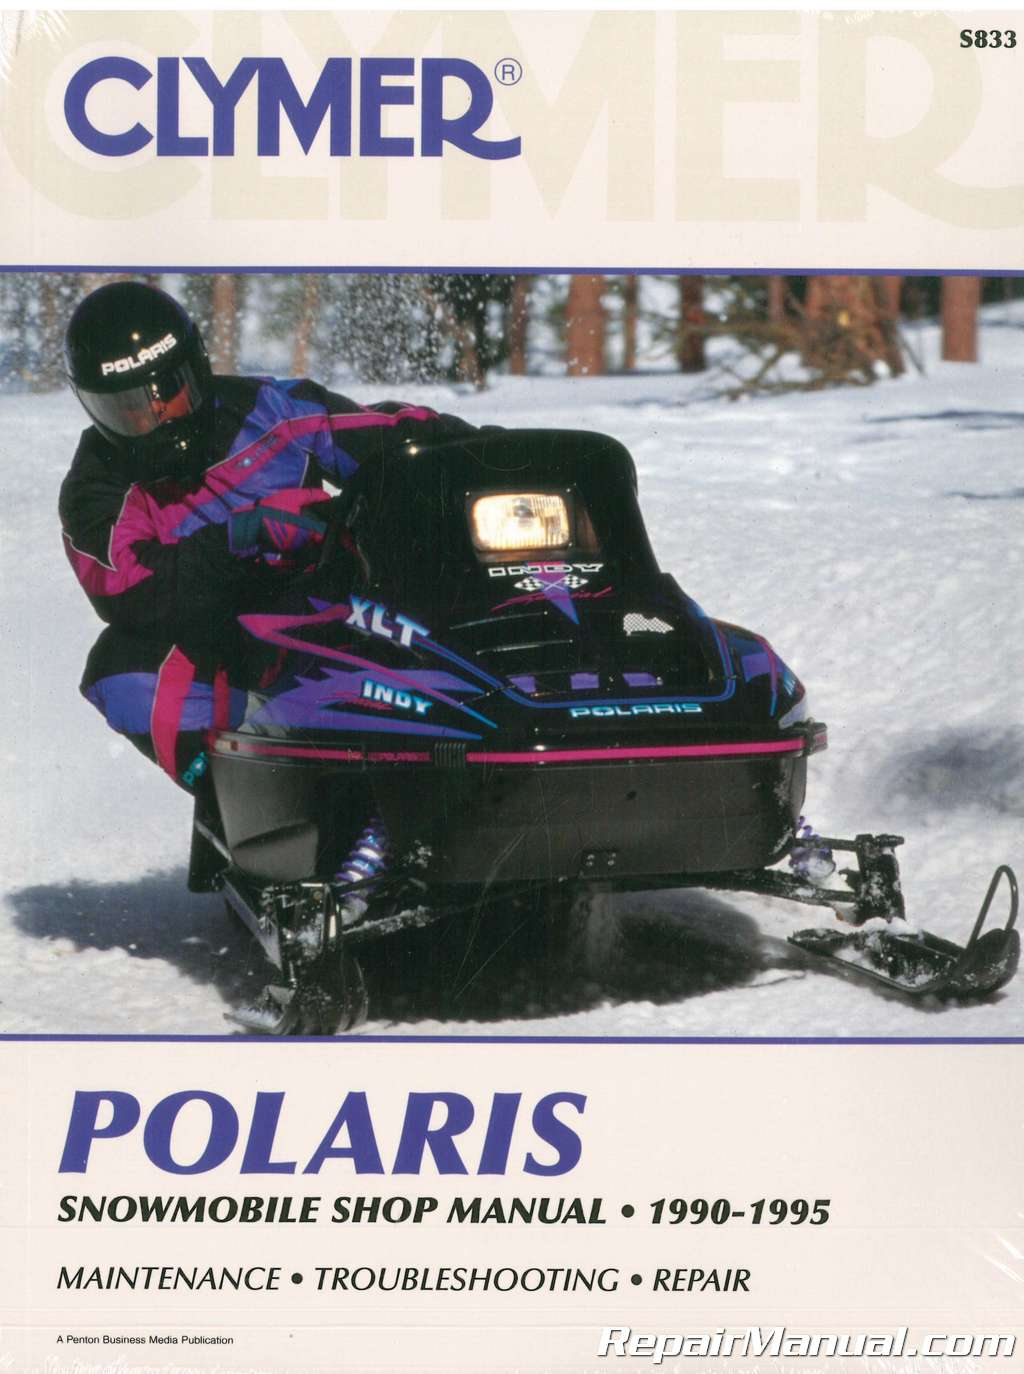 1990 1995 sks rxl xlt gt 400 500 650 clymer polaris snowmobile rh repairmanual com Polaris Snowmobiles 2018 Ski-Doo Snowmobile